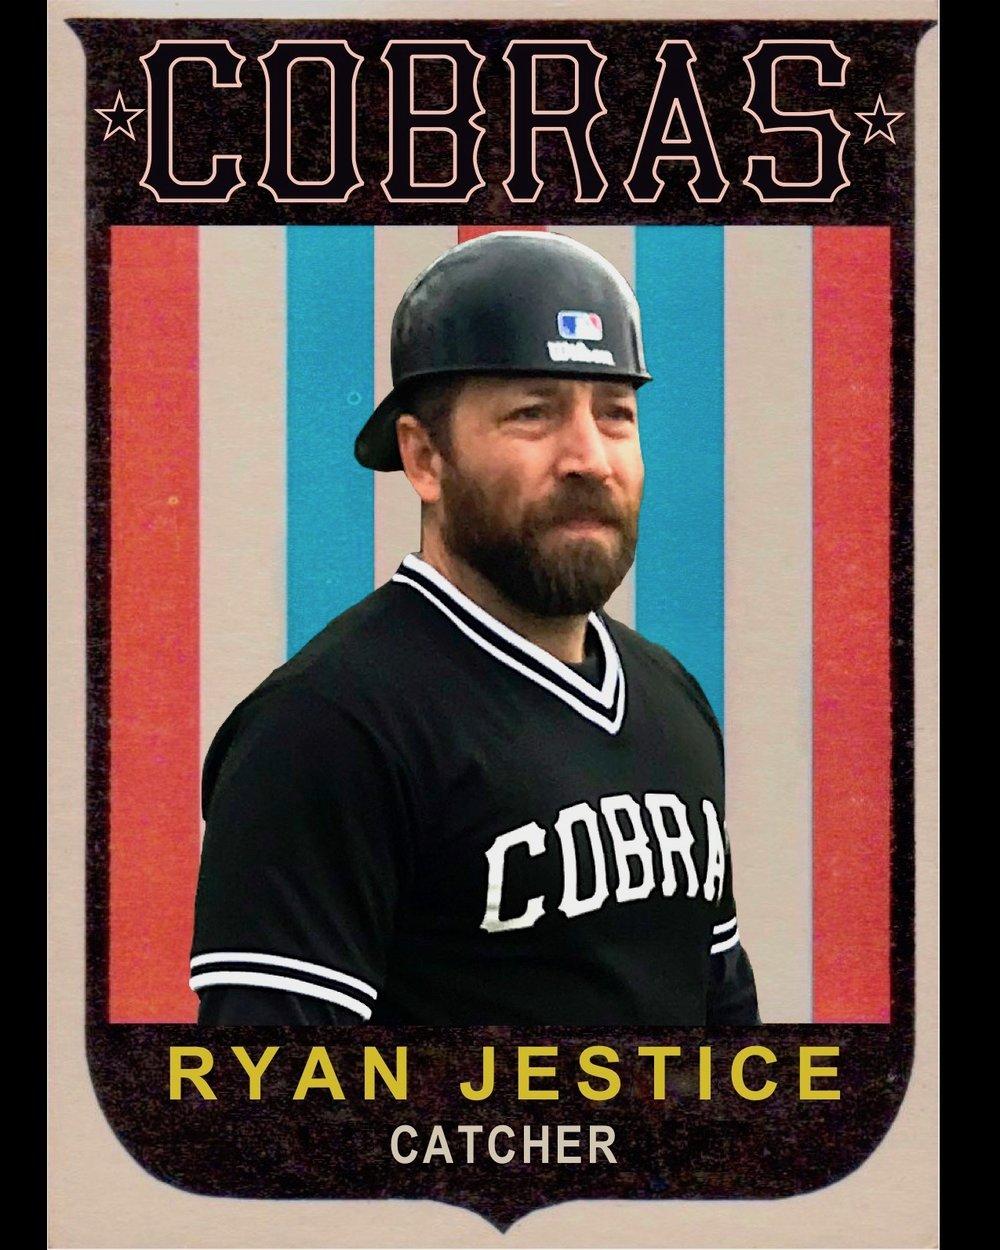 #4 - Ryan Jestice